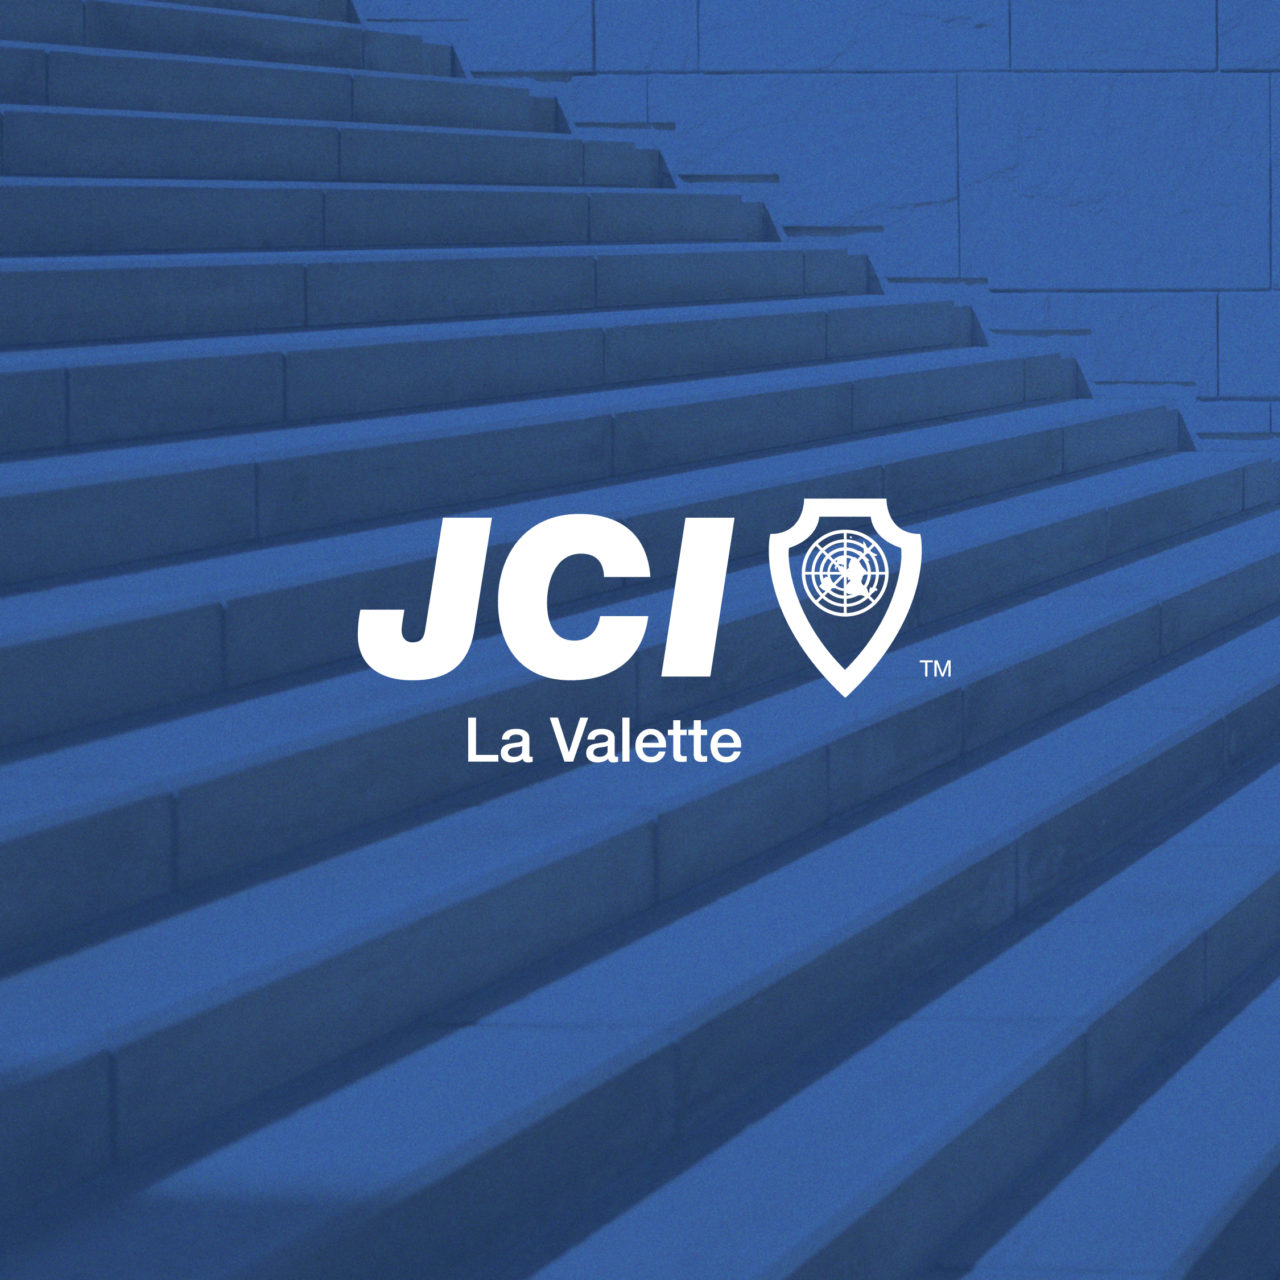 JCI La Vallette